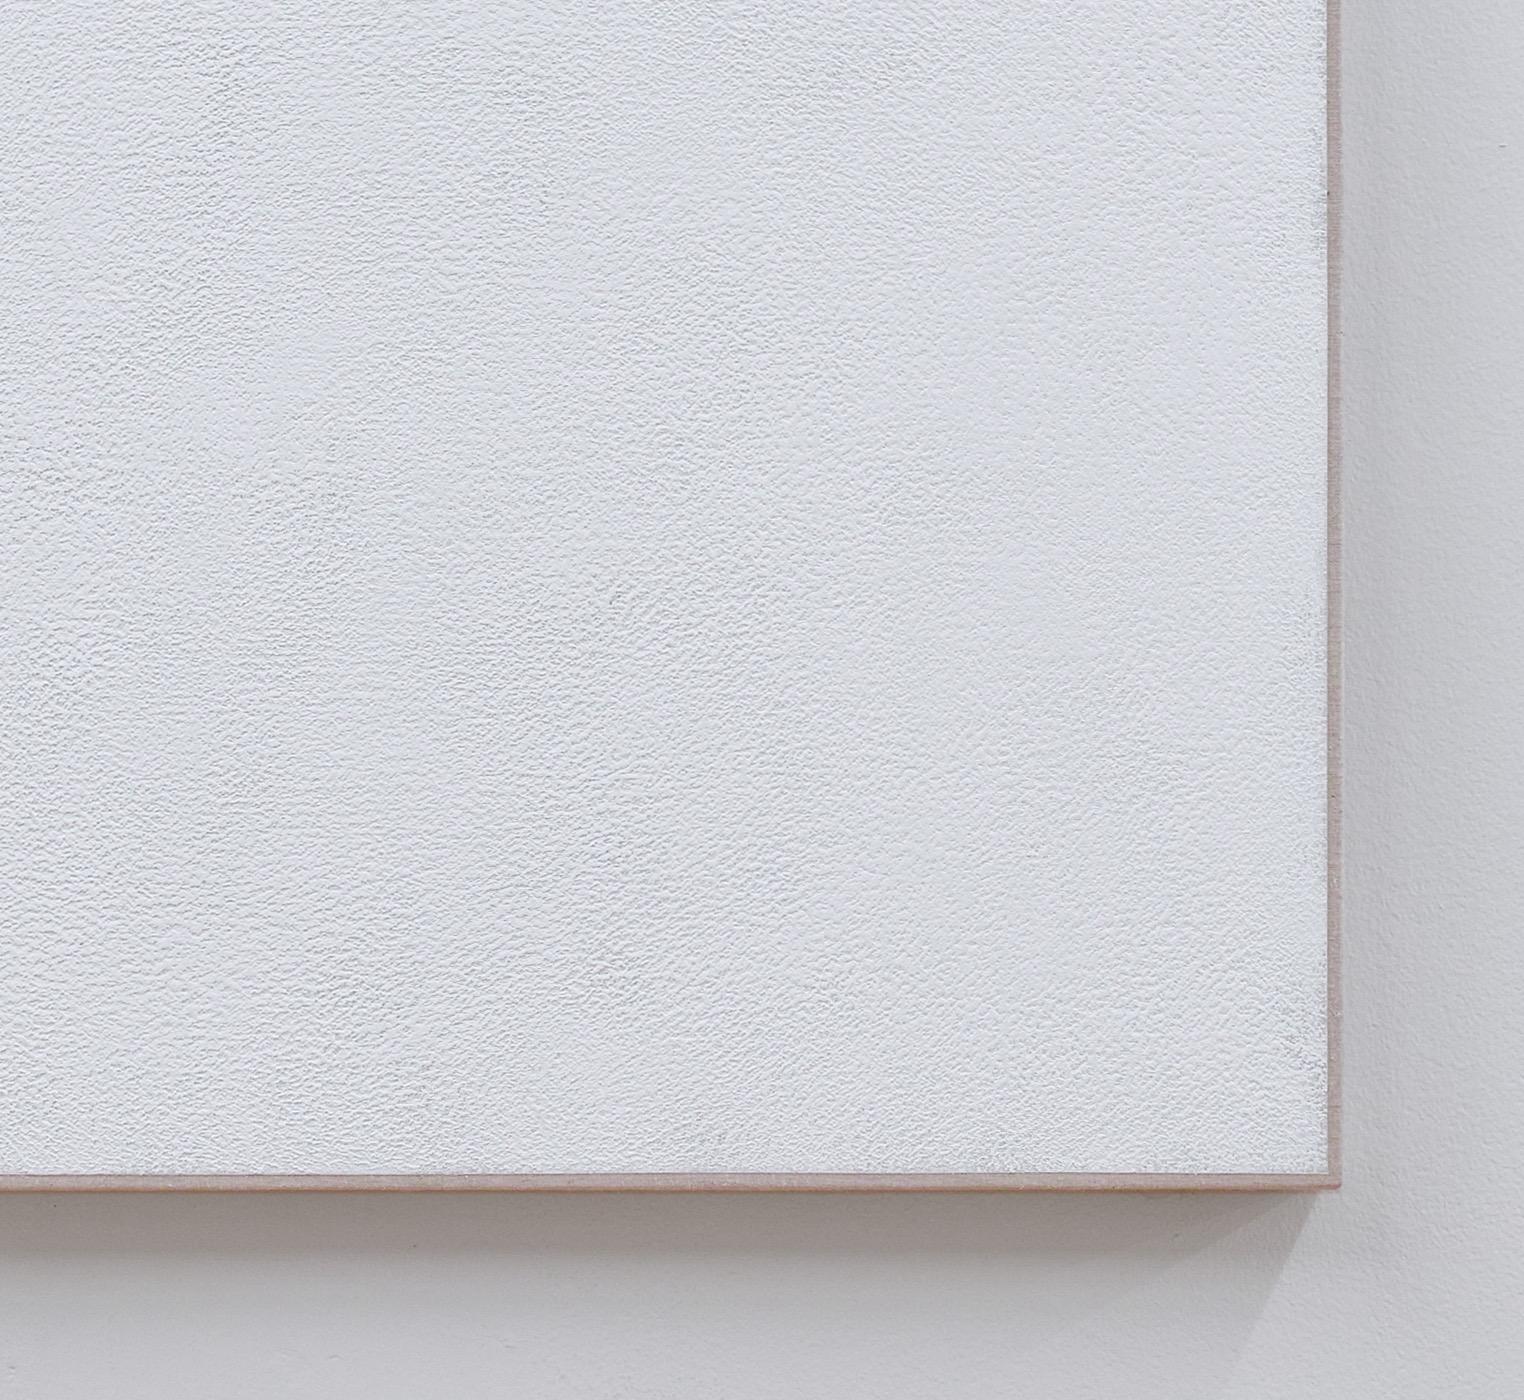 Untitled #1 2014-2015